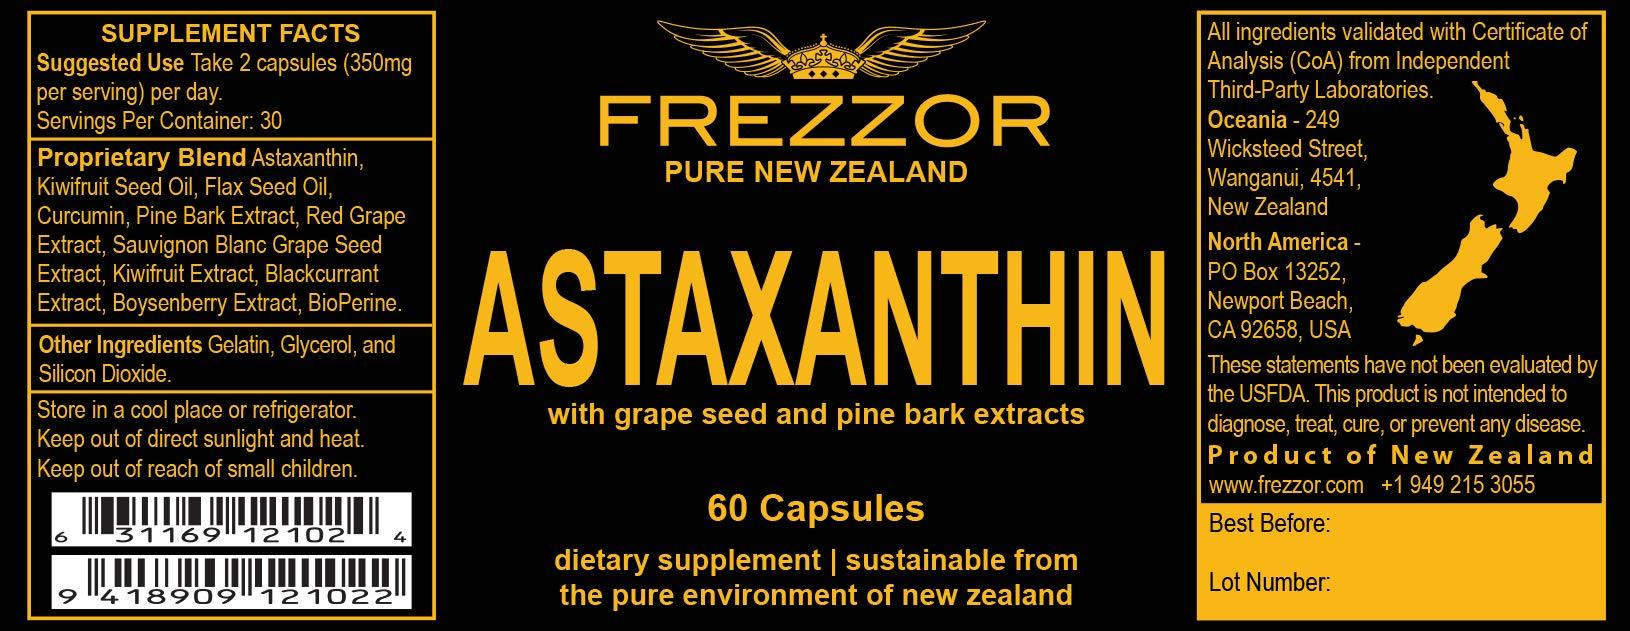 FREZZOR Pure New Zealand | Astaxanthin Black | Ultimate 11 Antioxidant Blend | Cognitive Memory Enhancer | Nootropic | Smart Supplement | All-Natural | Lab Certified